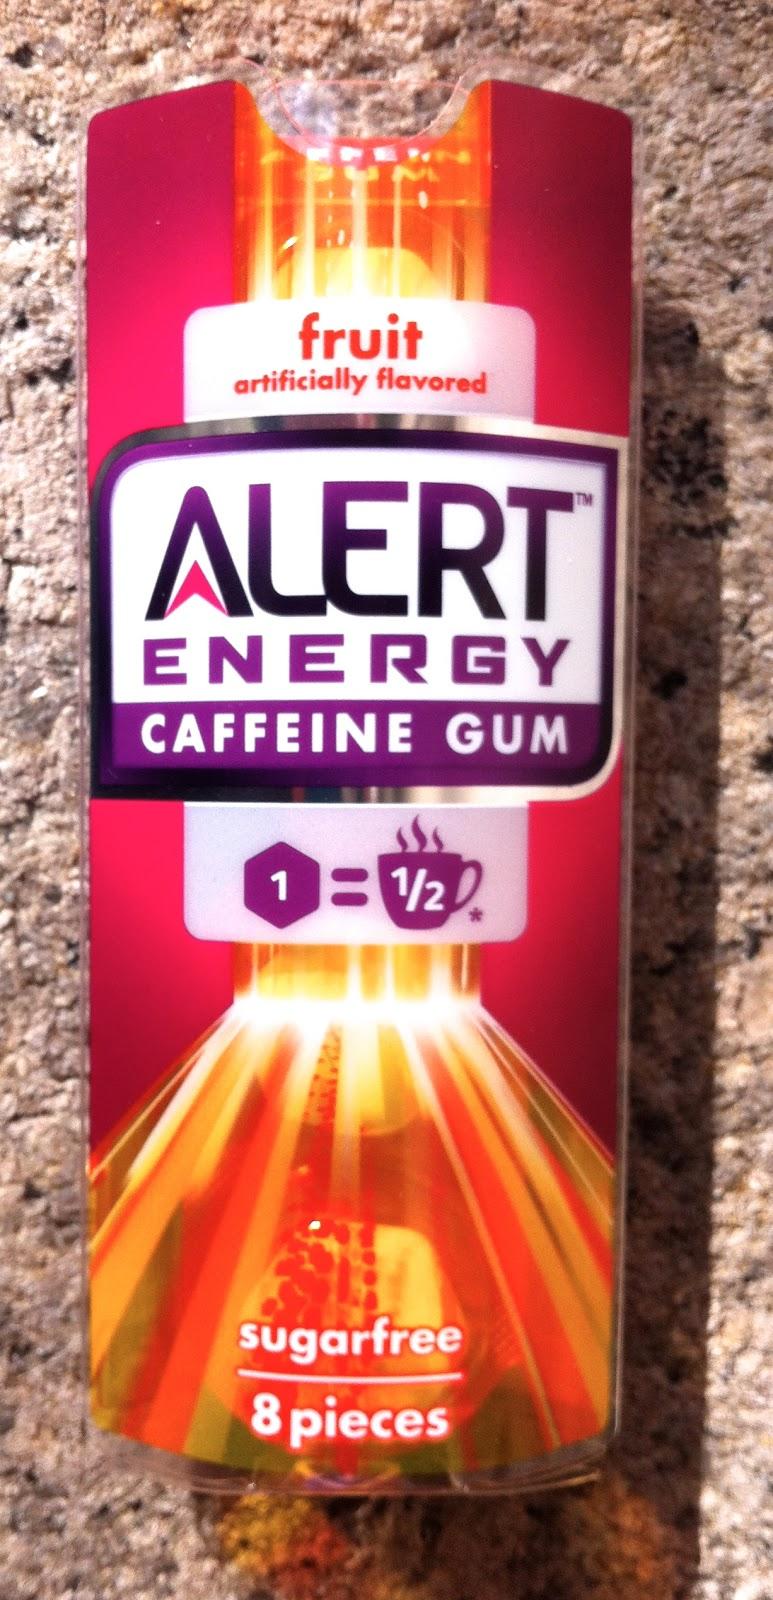 Obsessive Sweets: Wrigley Alert Energy Caffeine Gum Banned: I'm